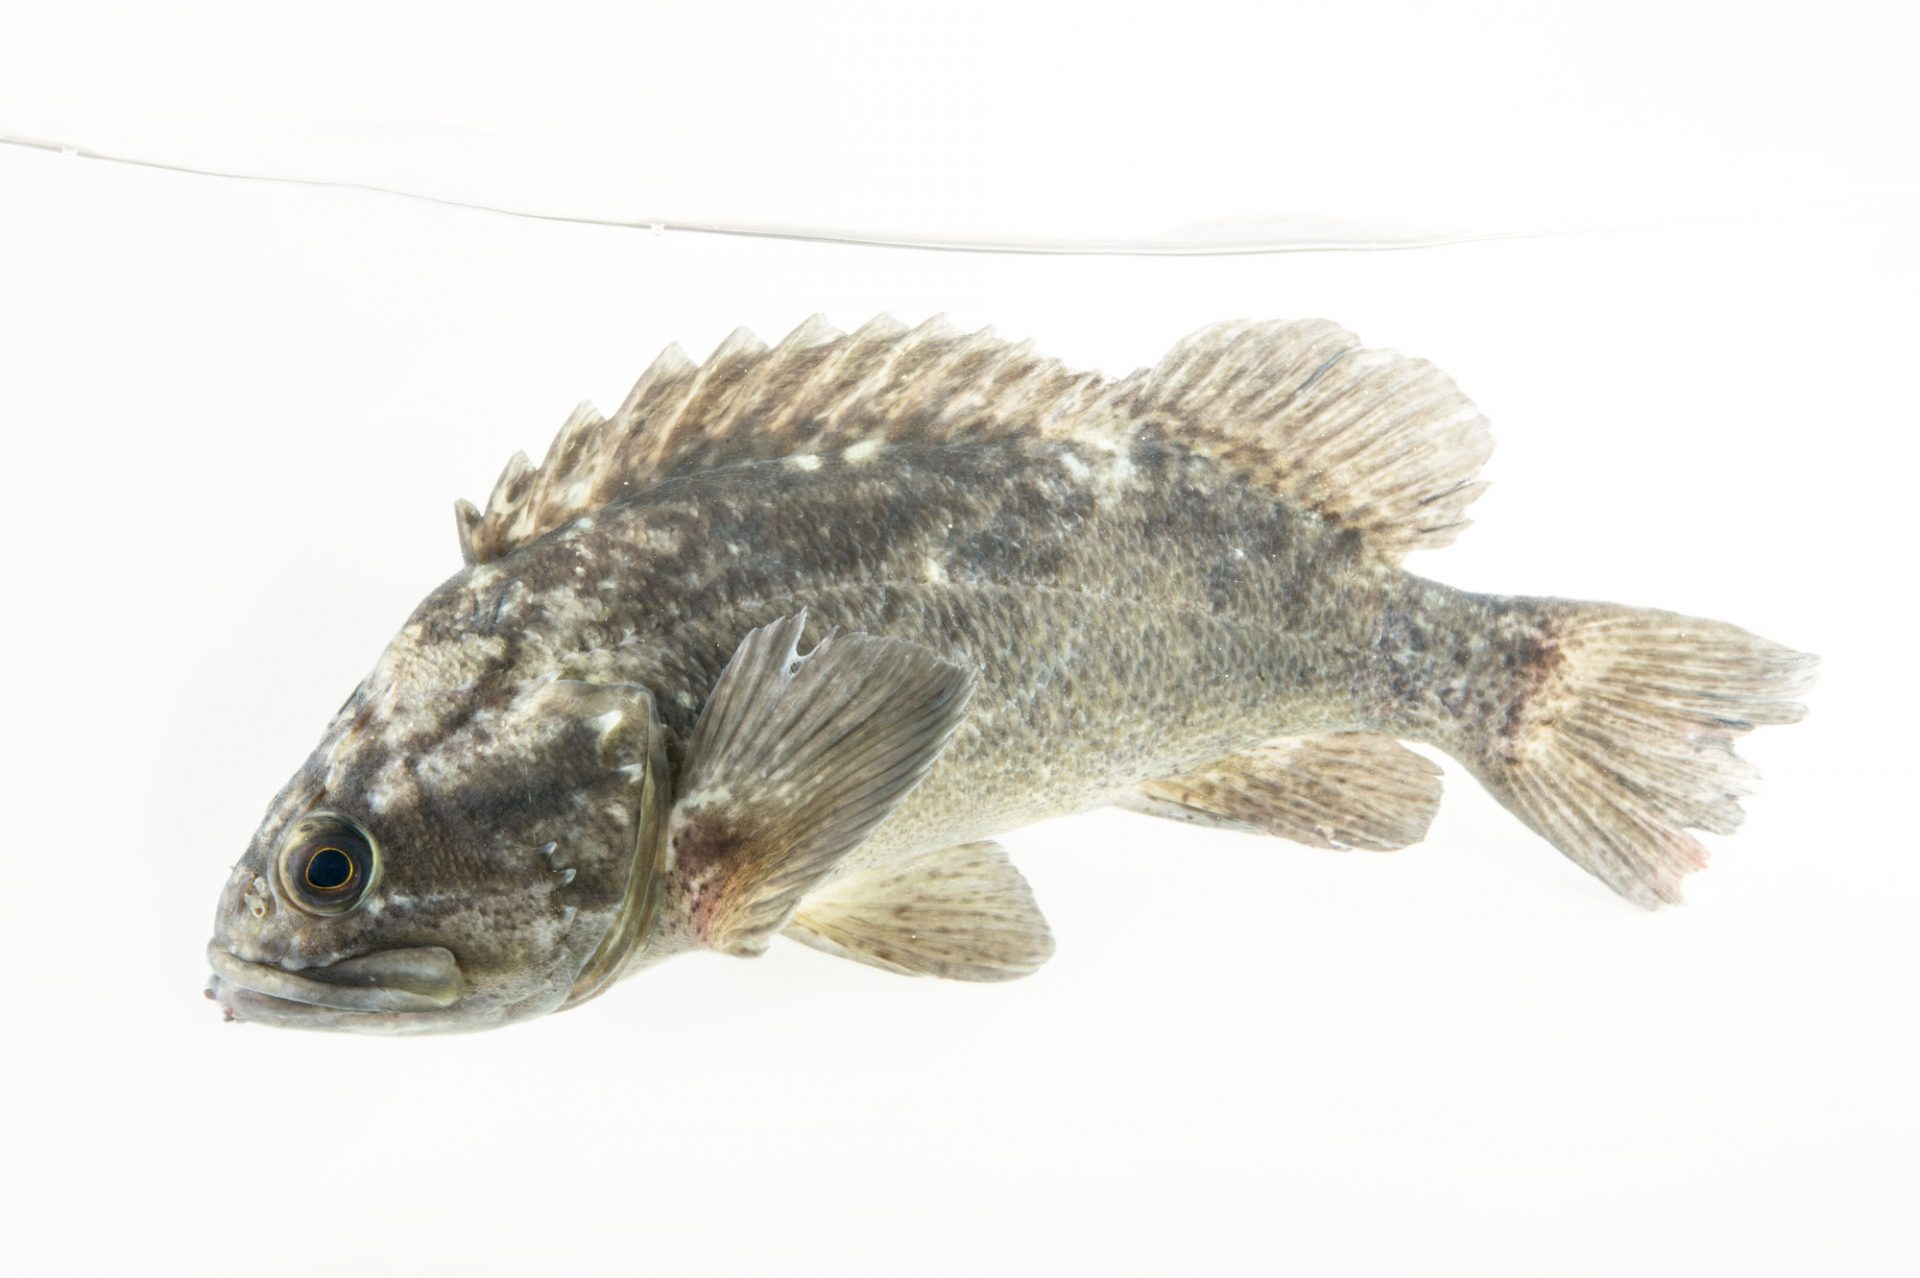 Picture of a grass rockfish (Sebastes rastrelliger) at the REEF, at the University of California, Santa Barbara.